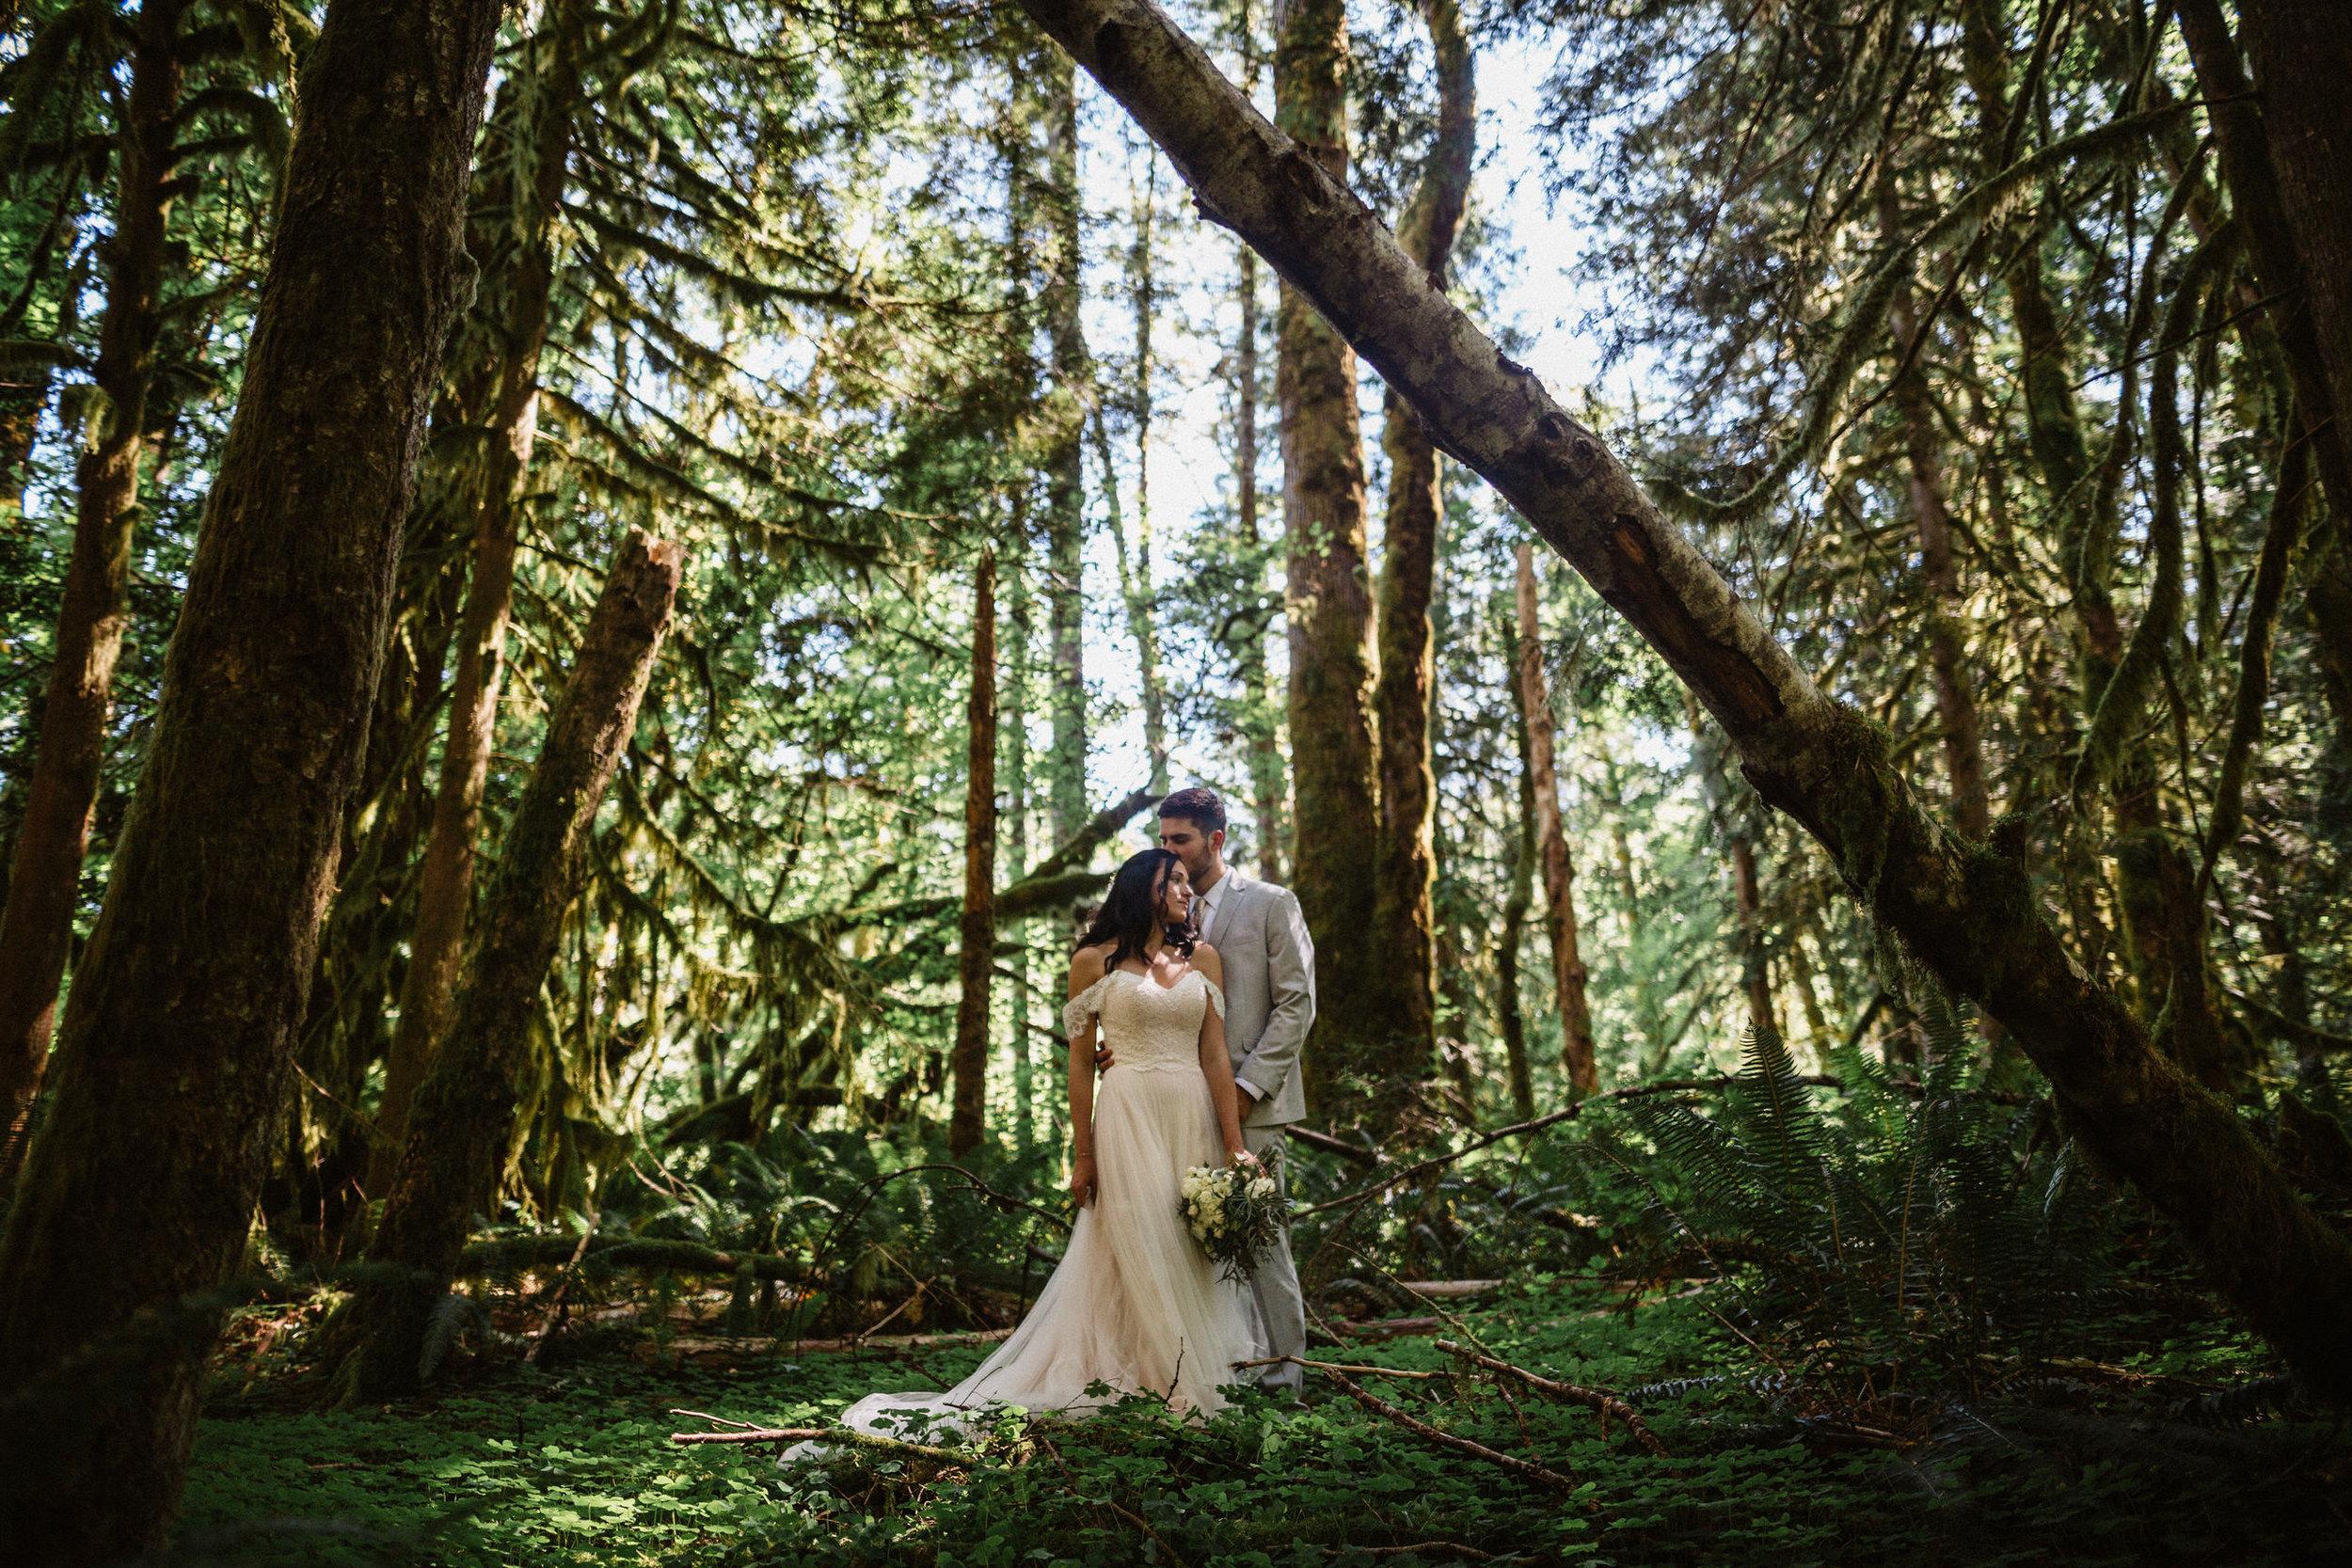 Mark Federighi Portland Oregon Seattle Destination Wedding Photographer0013.JPG